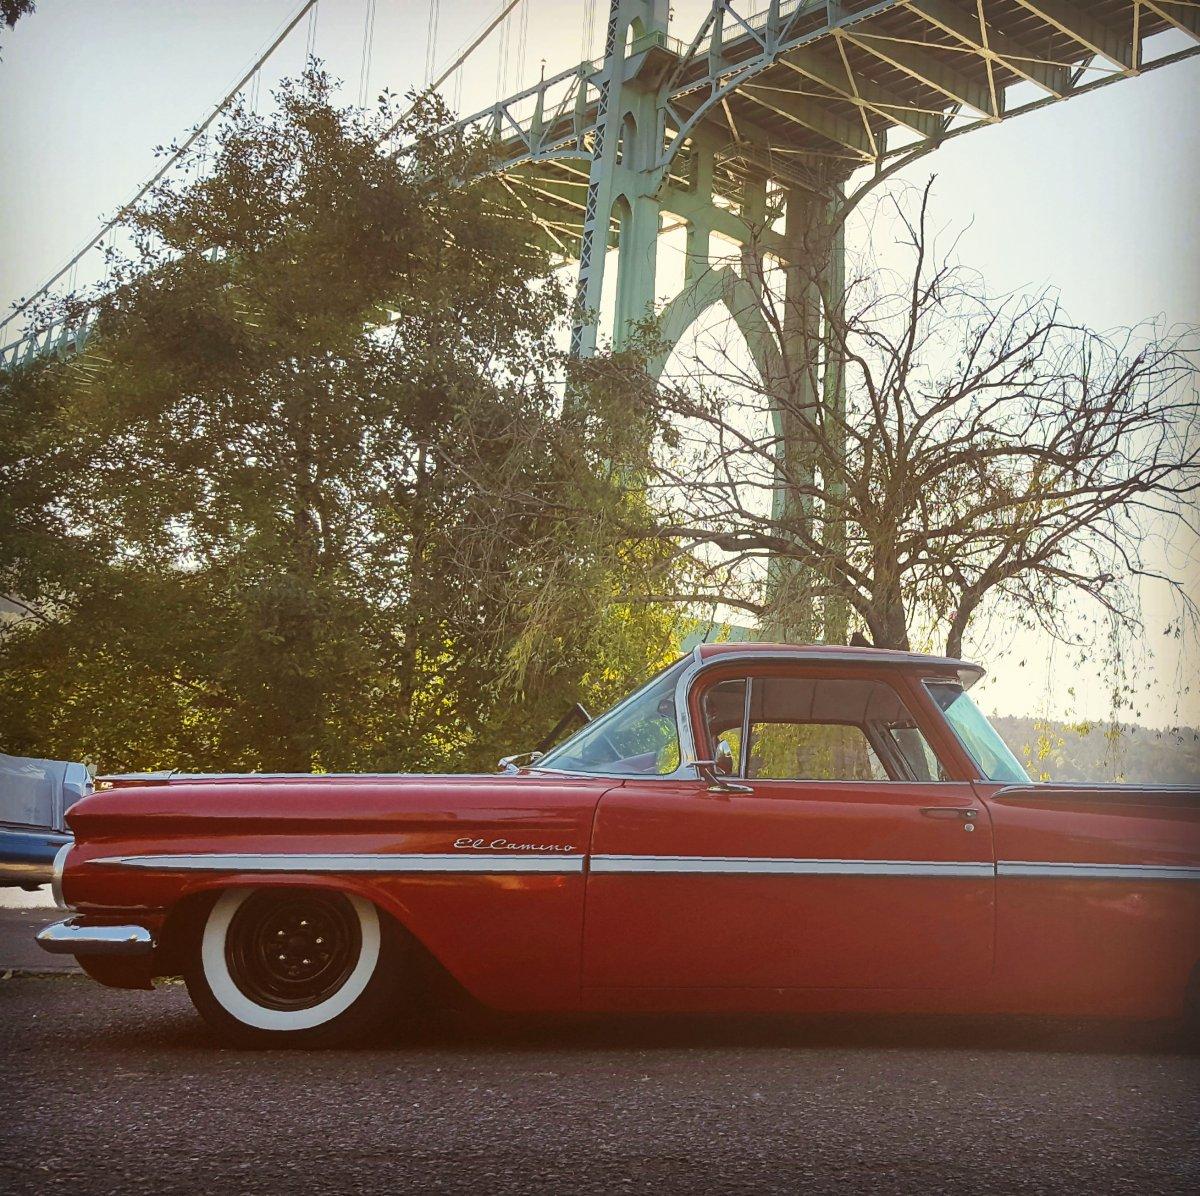 1959 El camino st johns bridge cathedral park2.jpg